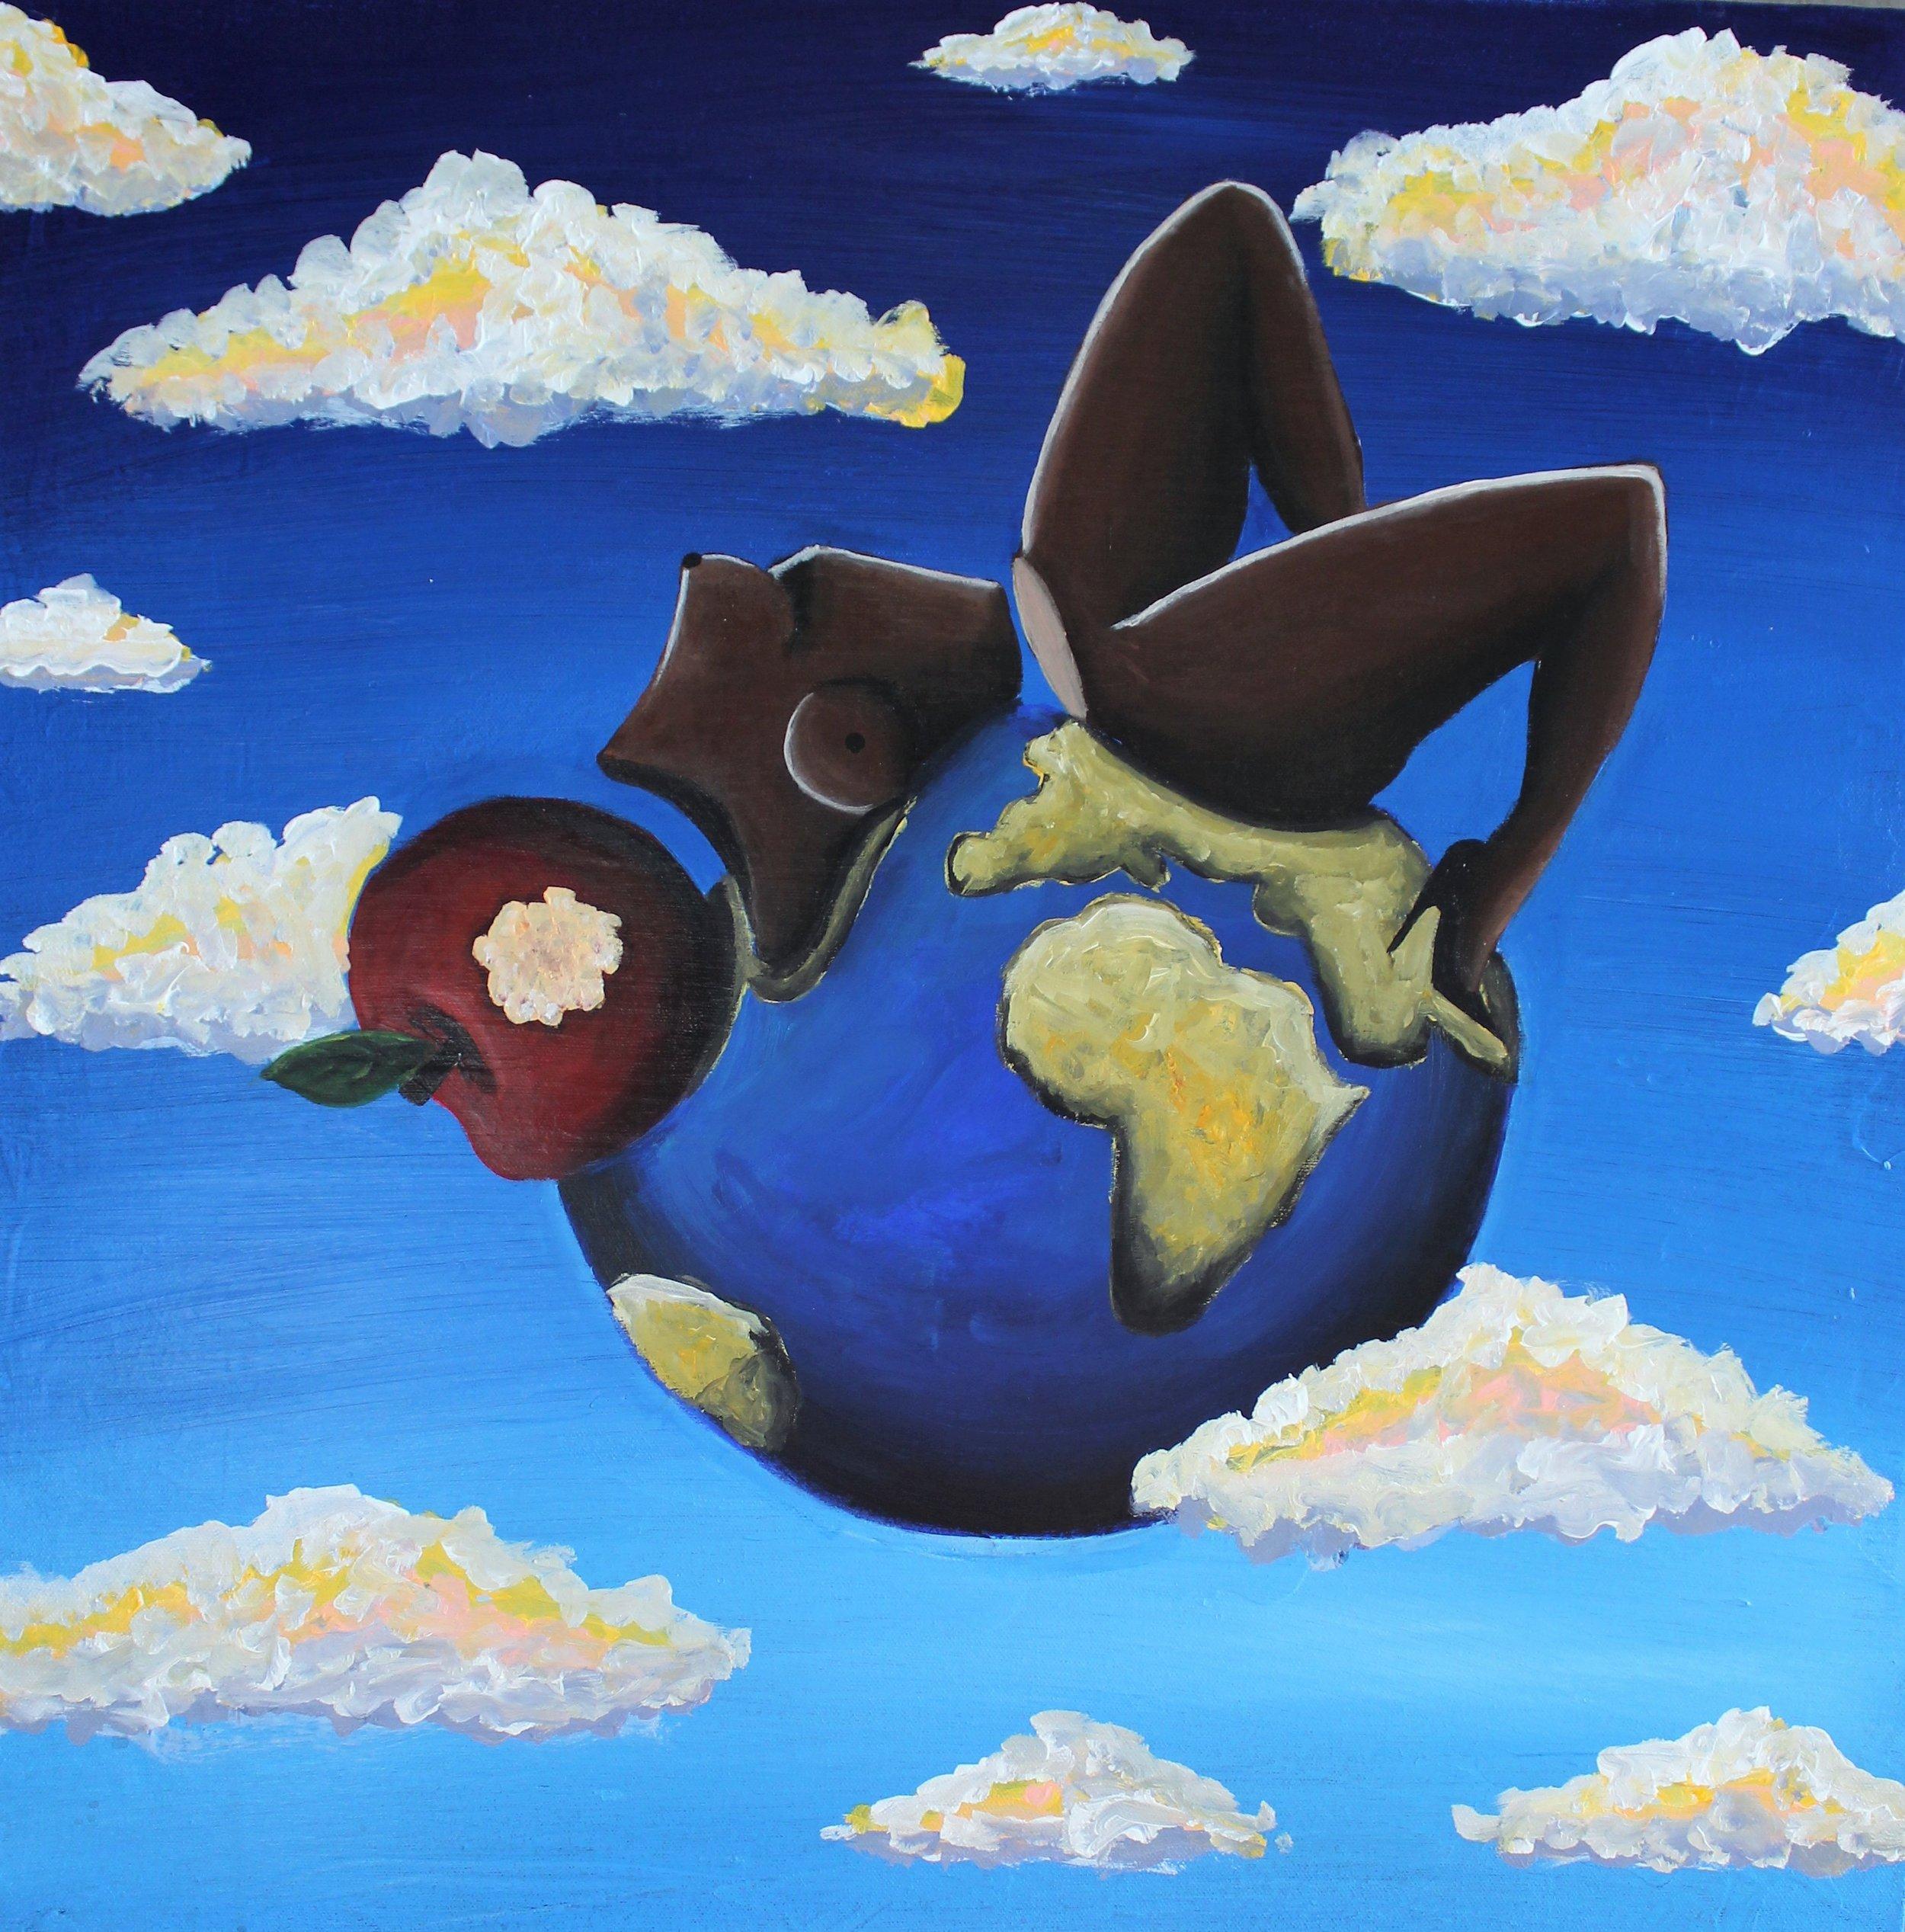 Abi Salami -In this World Alone - Acrylic on canvas - 24H 24W 1.5D- 2018 - $1500.jpg.jpg